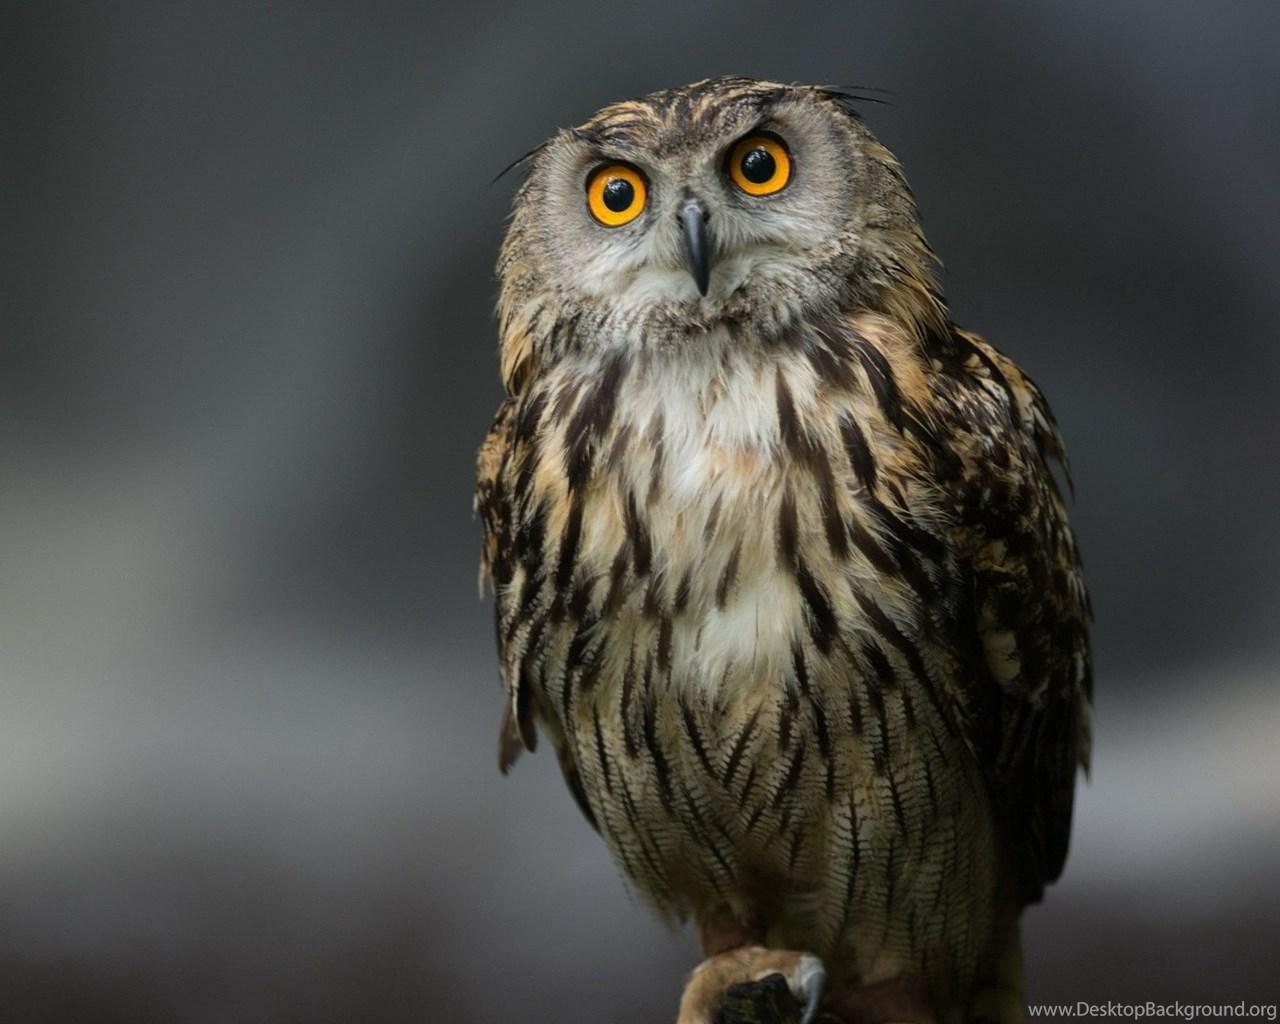 download wallpapers 3840x2160 owl bird predator sitting